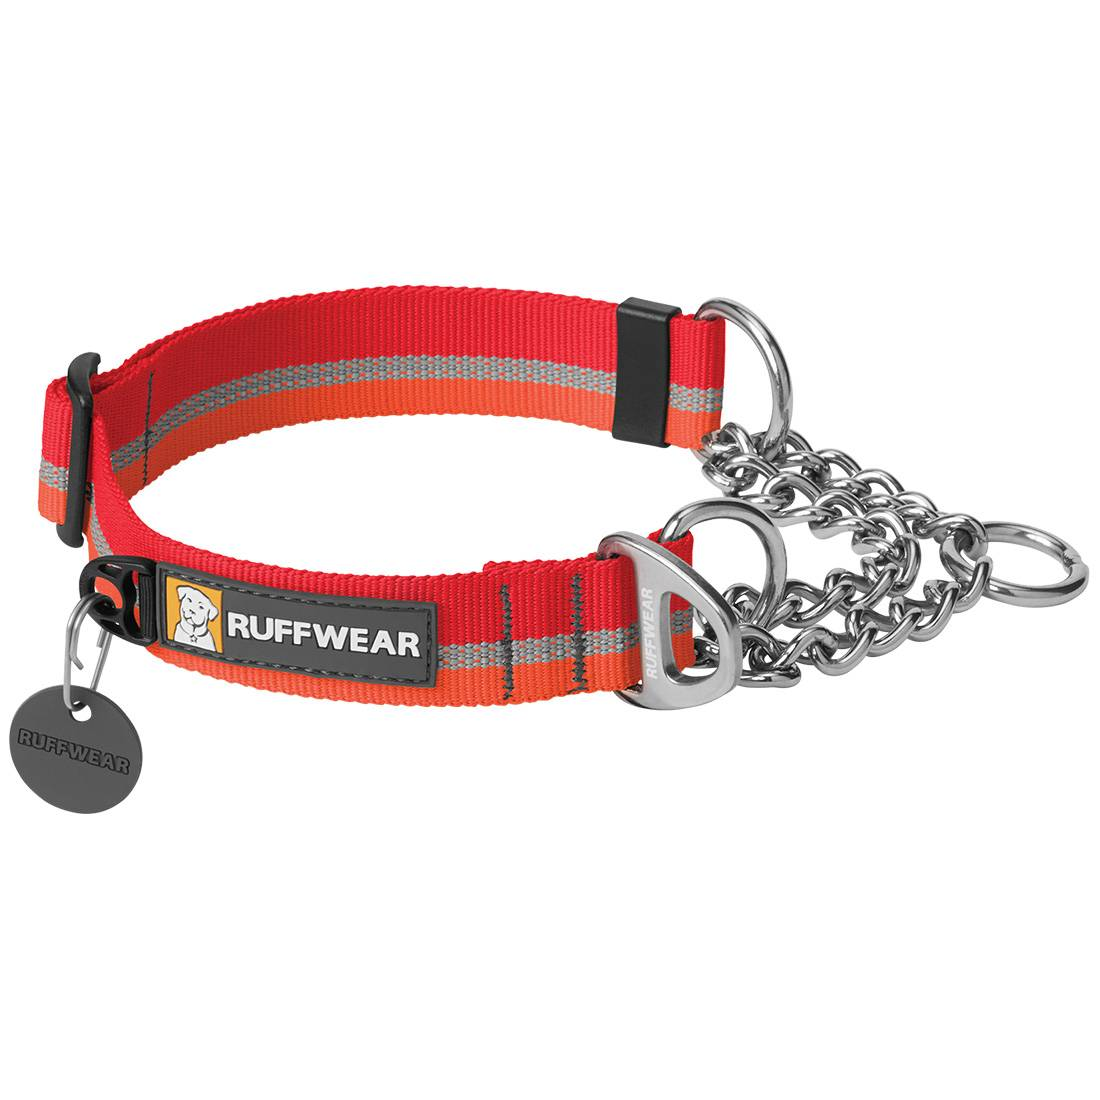 Ruffwear Collier pour chien Ruffwear Chain Reaction rouge Taille : M